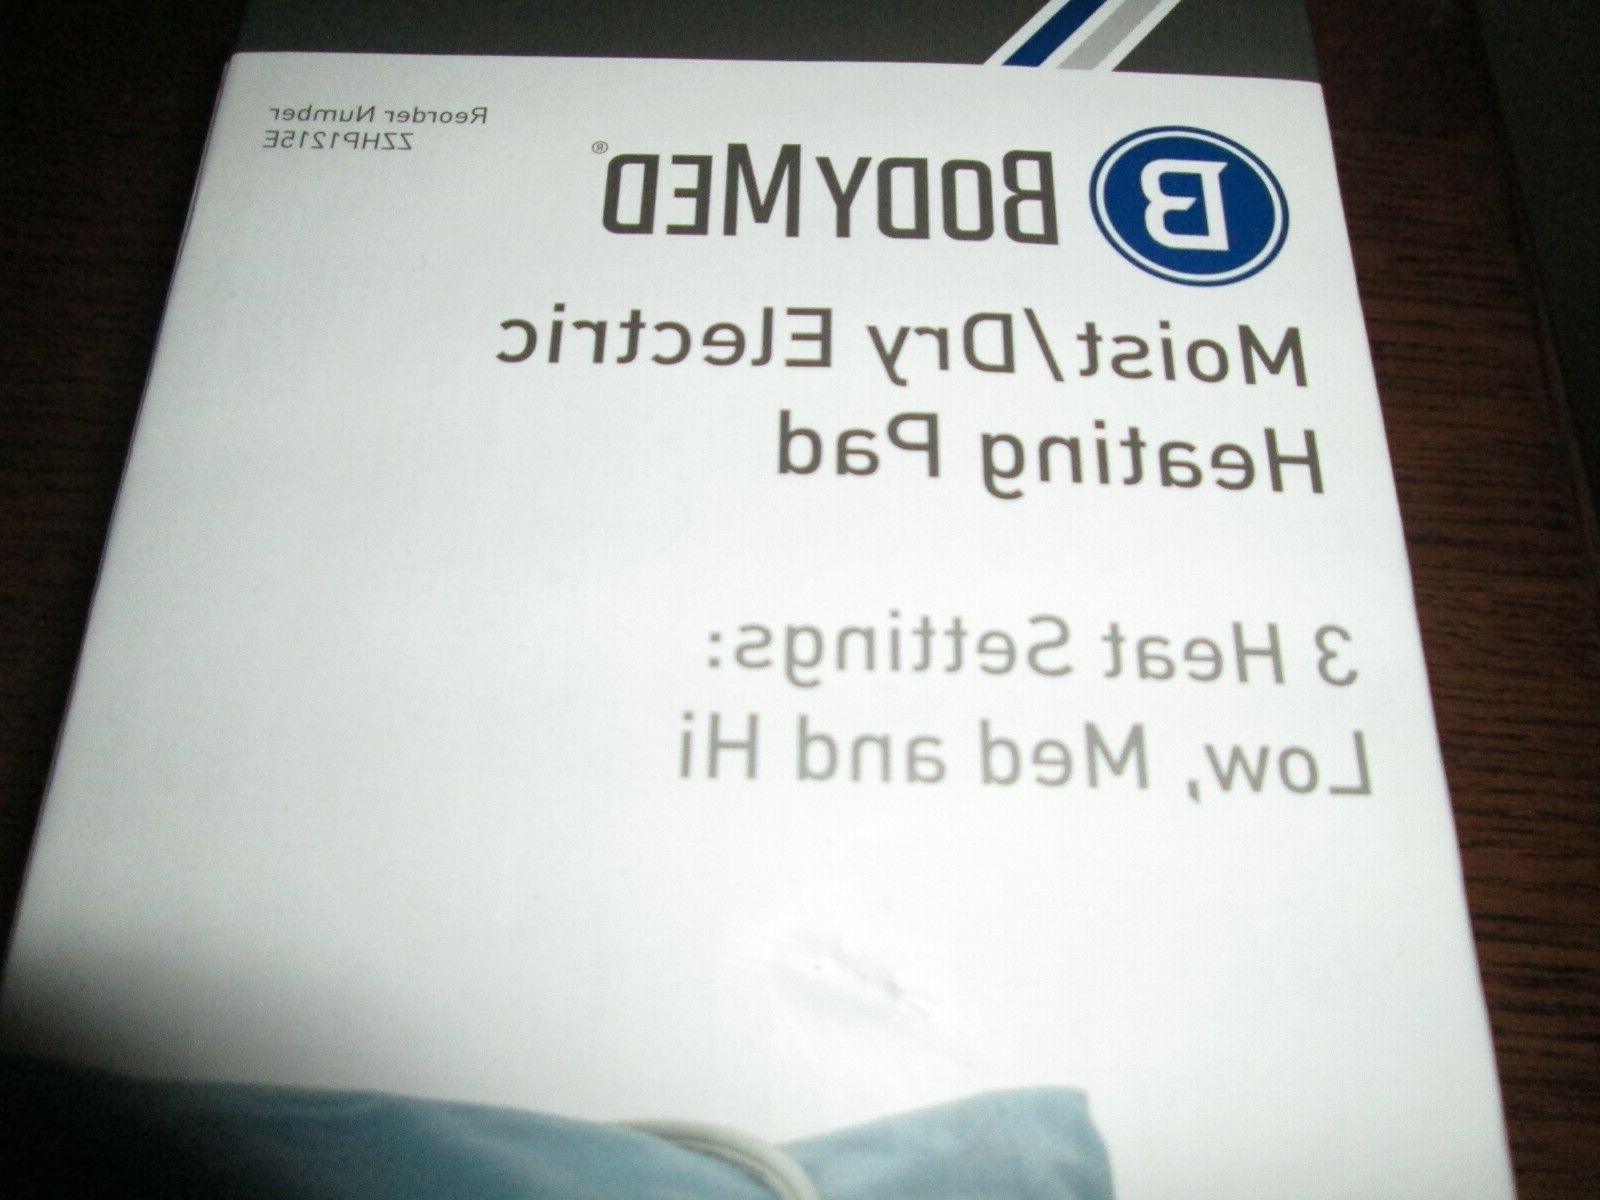 BODYMED MOIST/DRY ELECTRIC PAD SETTINGS*